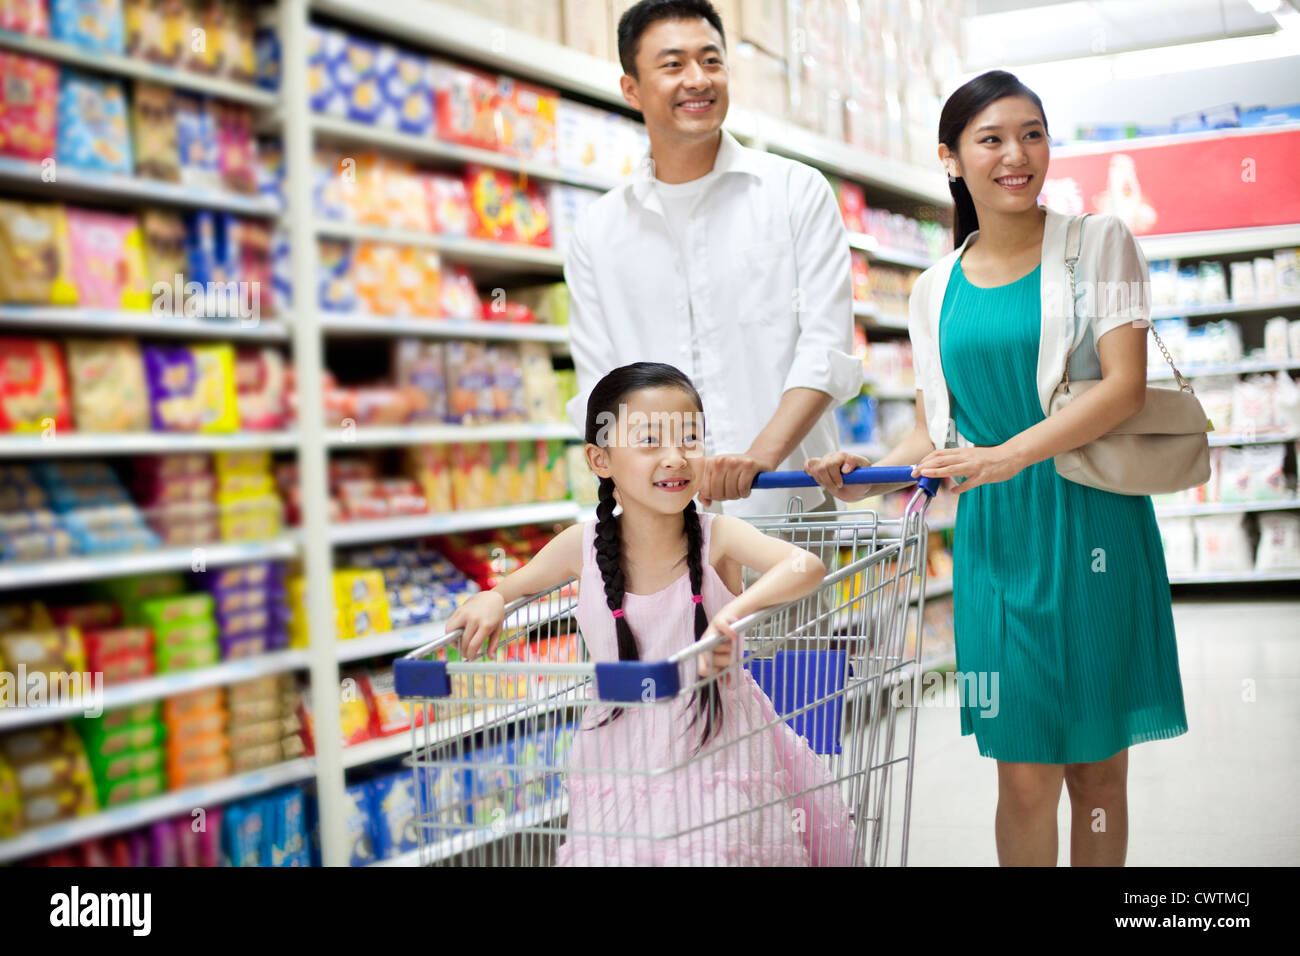 Family shopping in supermarket Stock Photo - Alamy